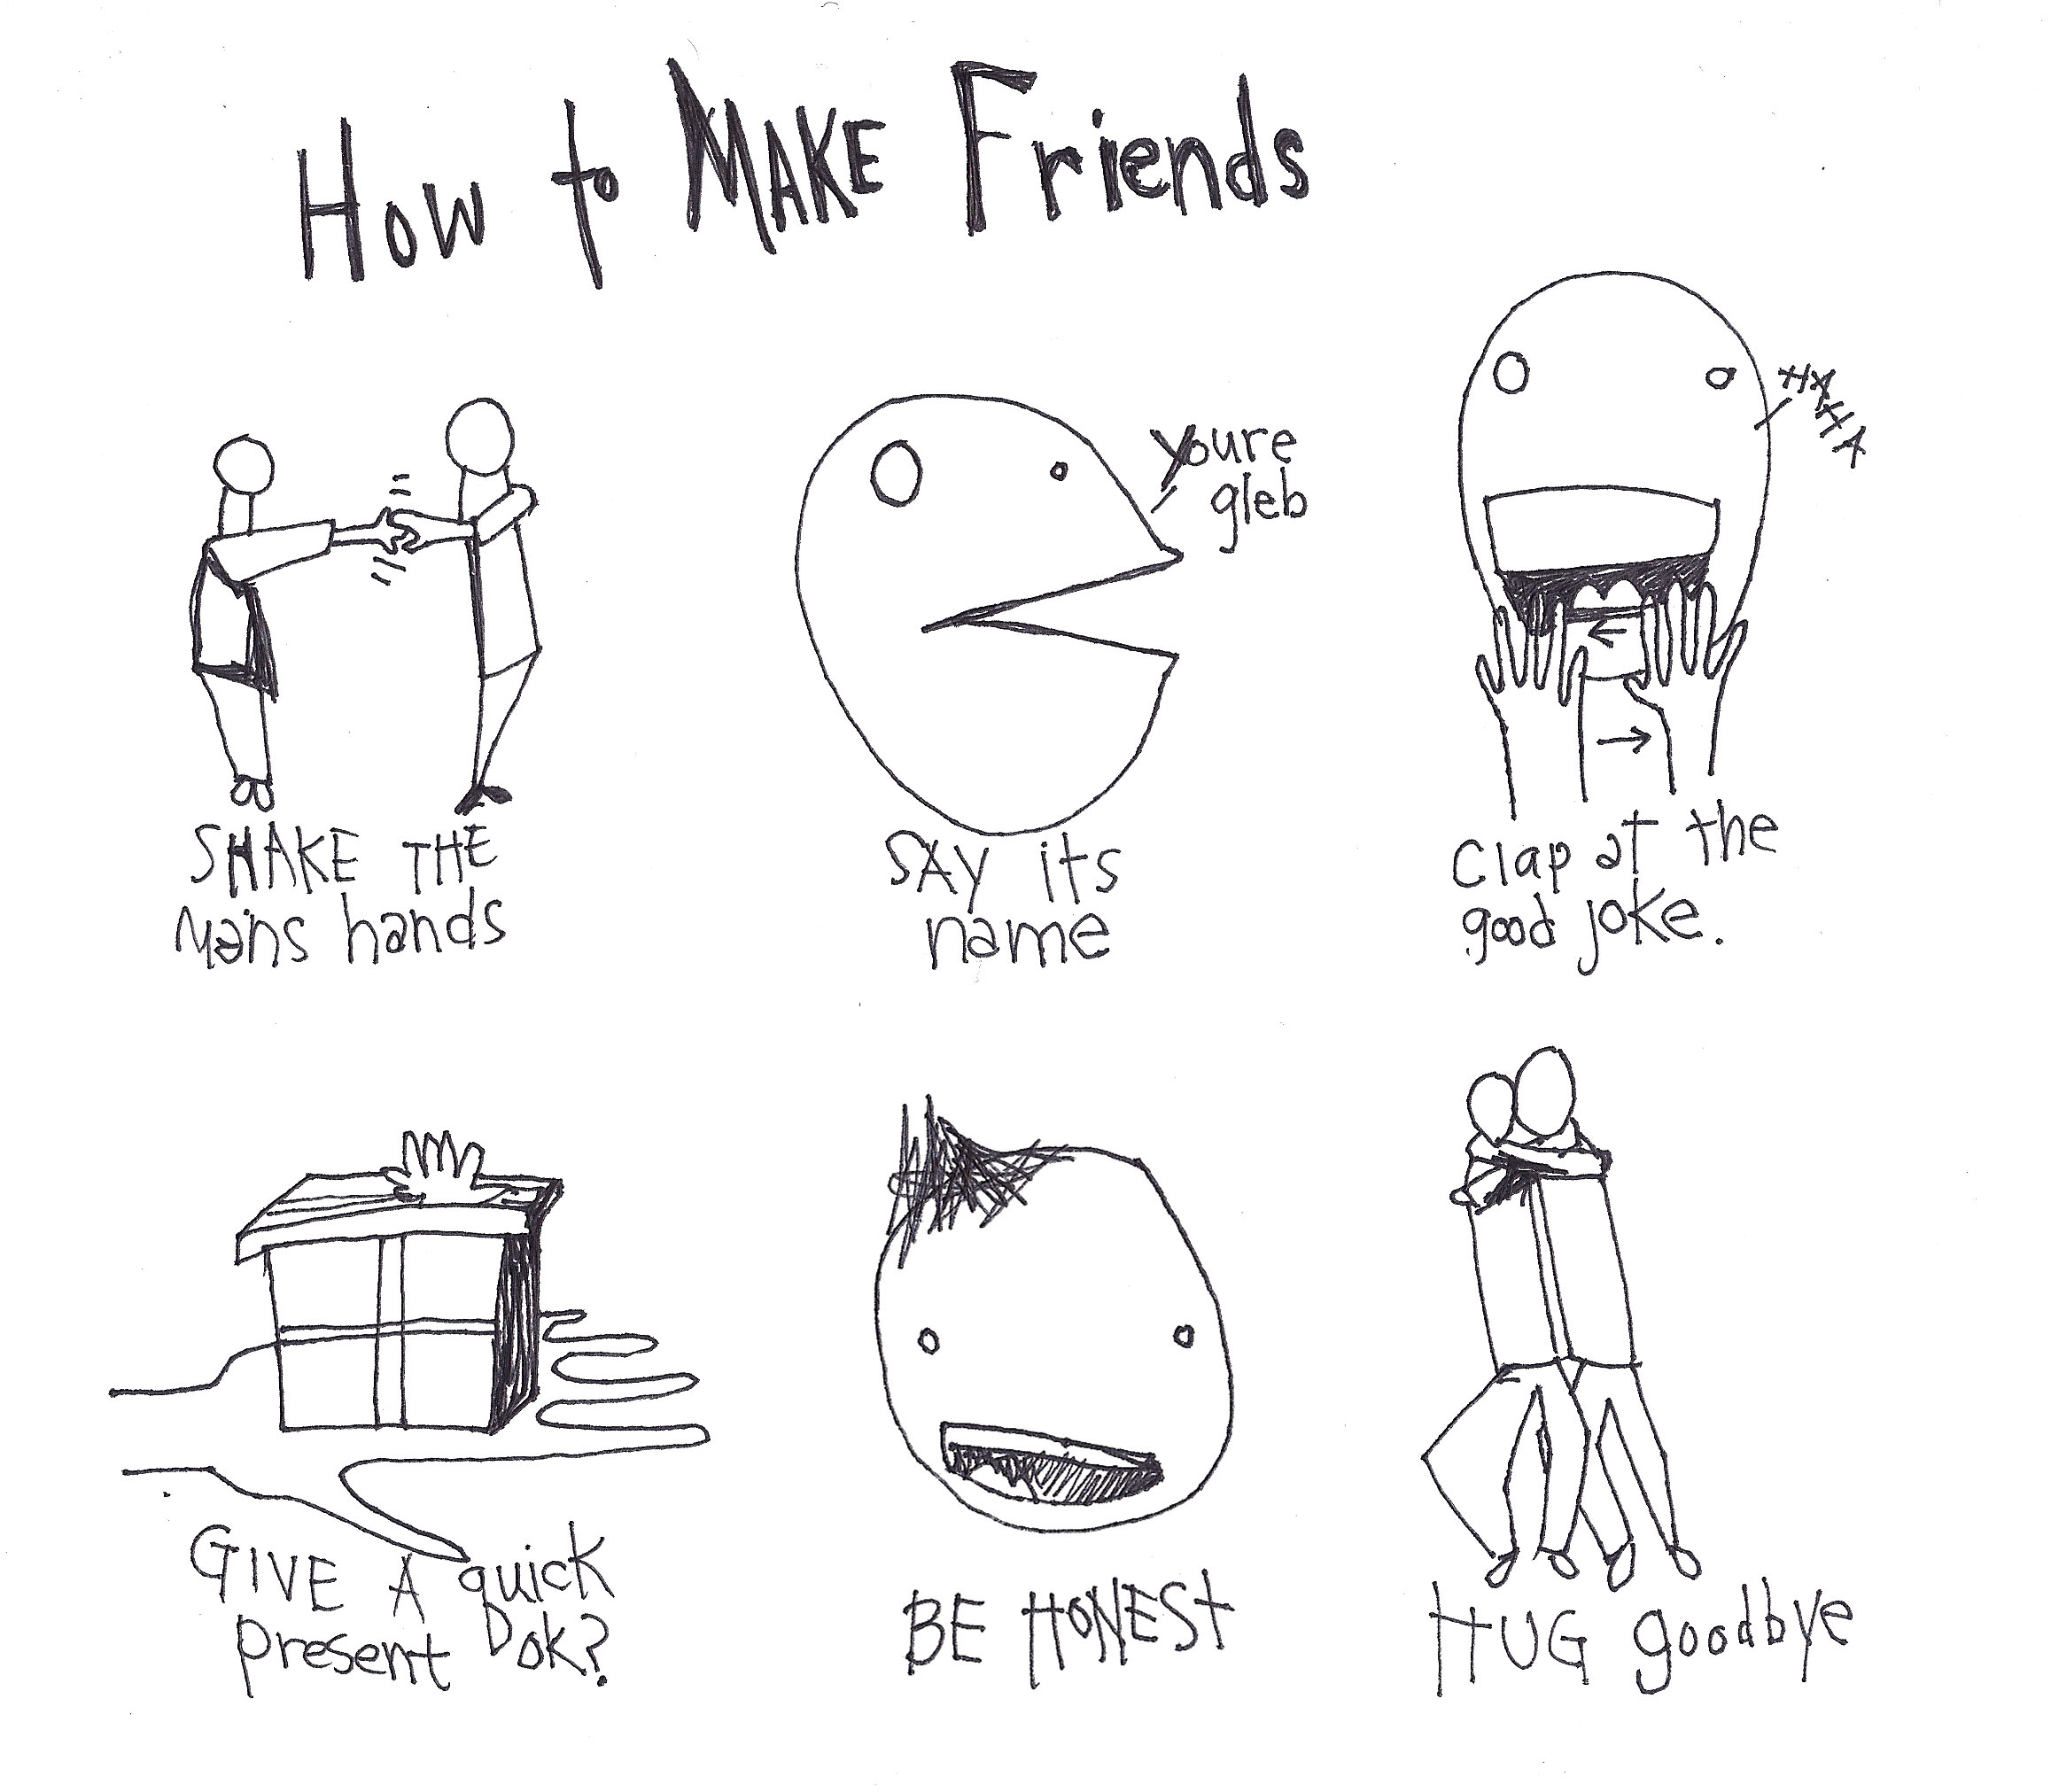 make friends.jpg